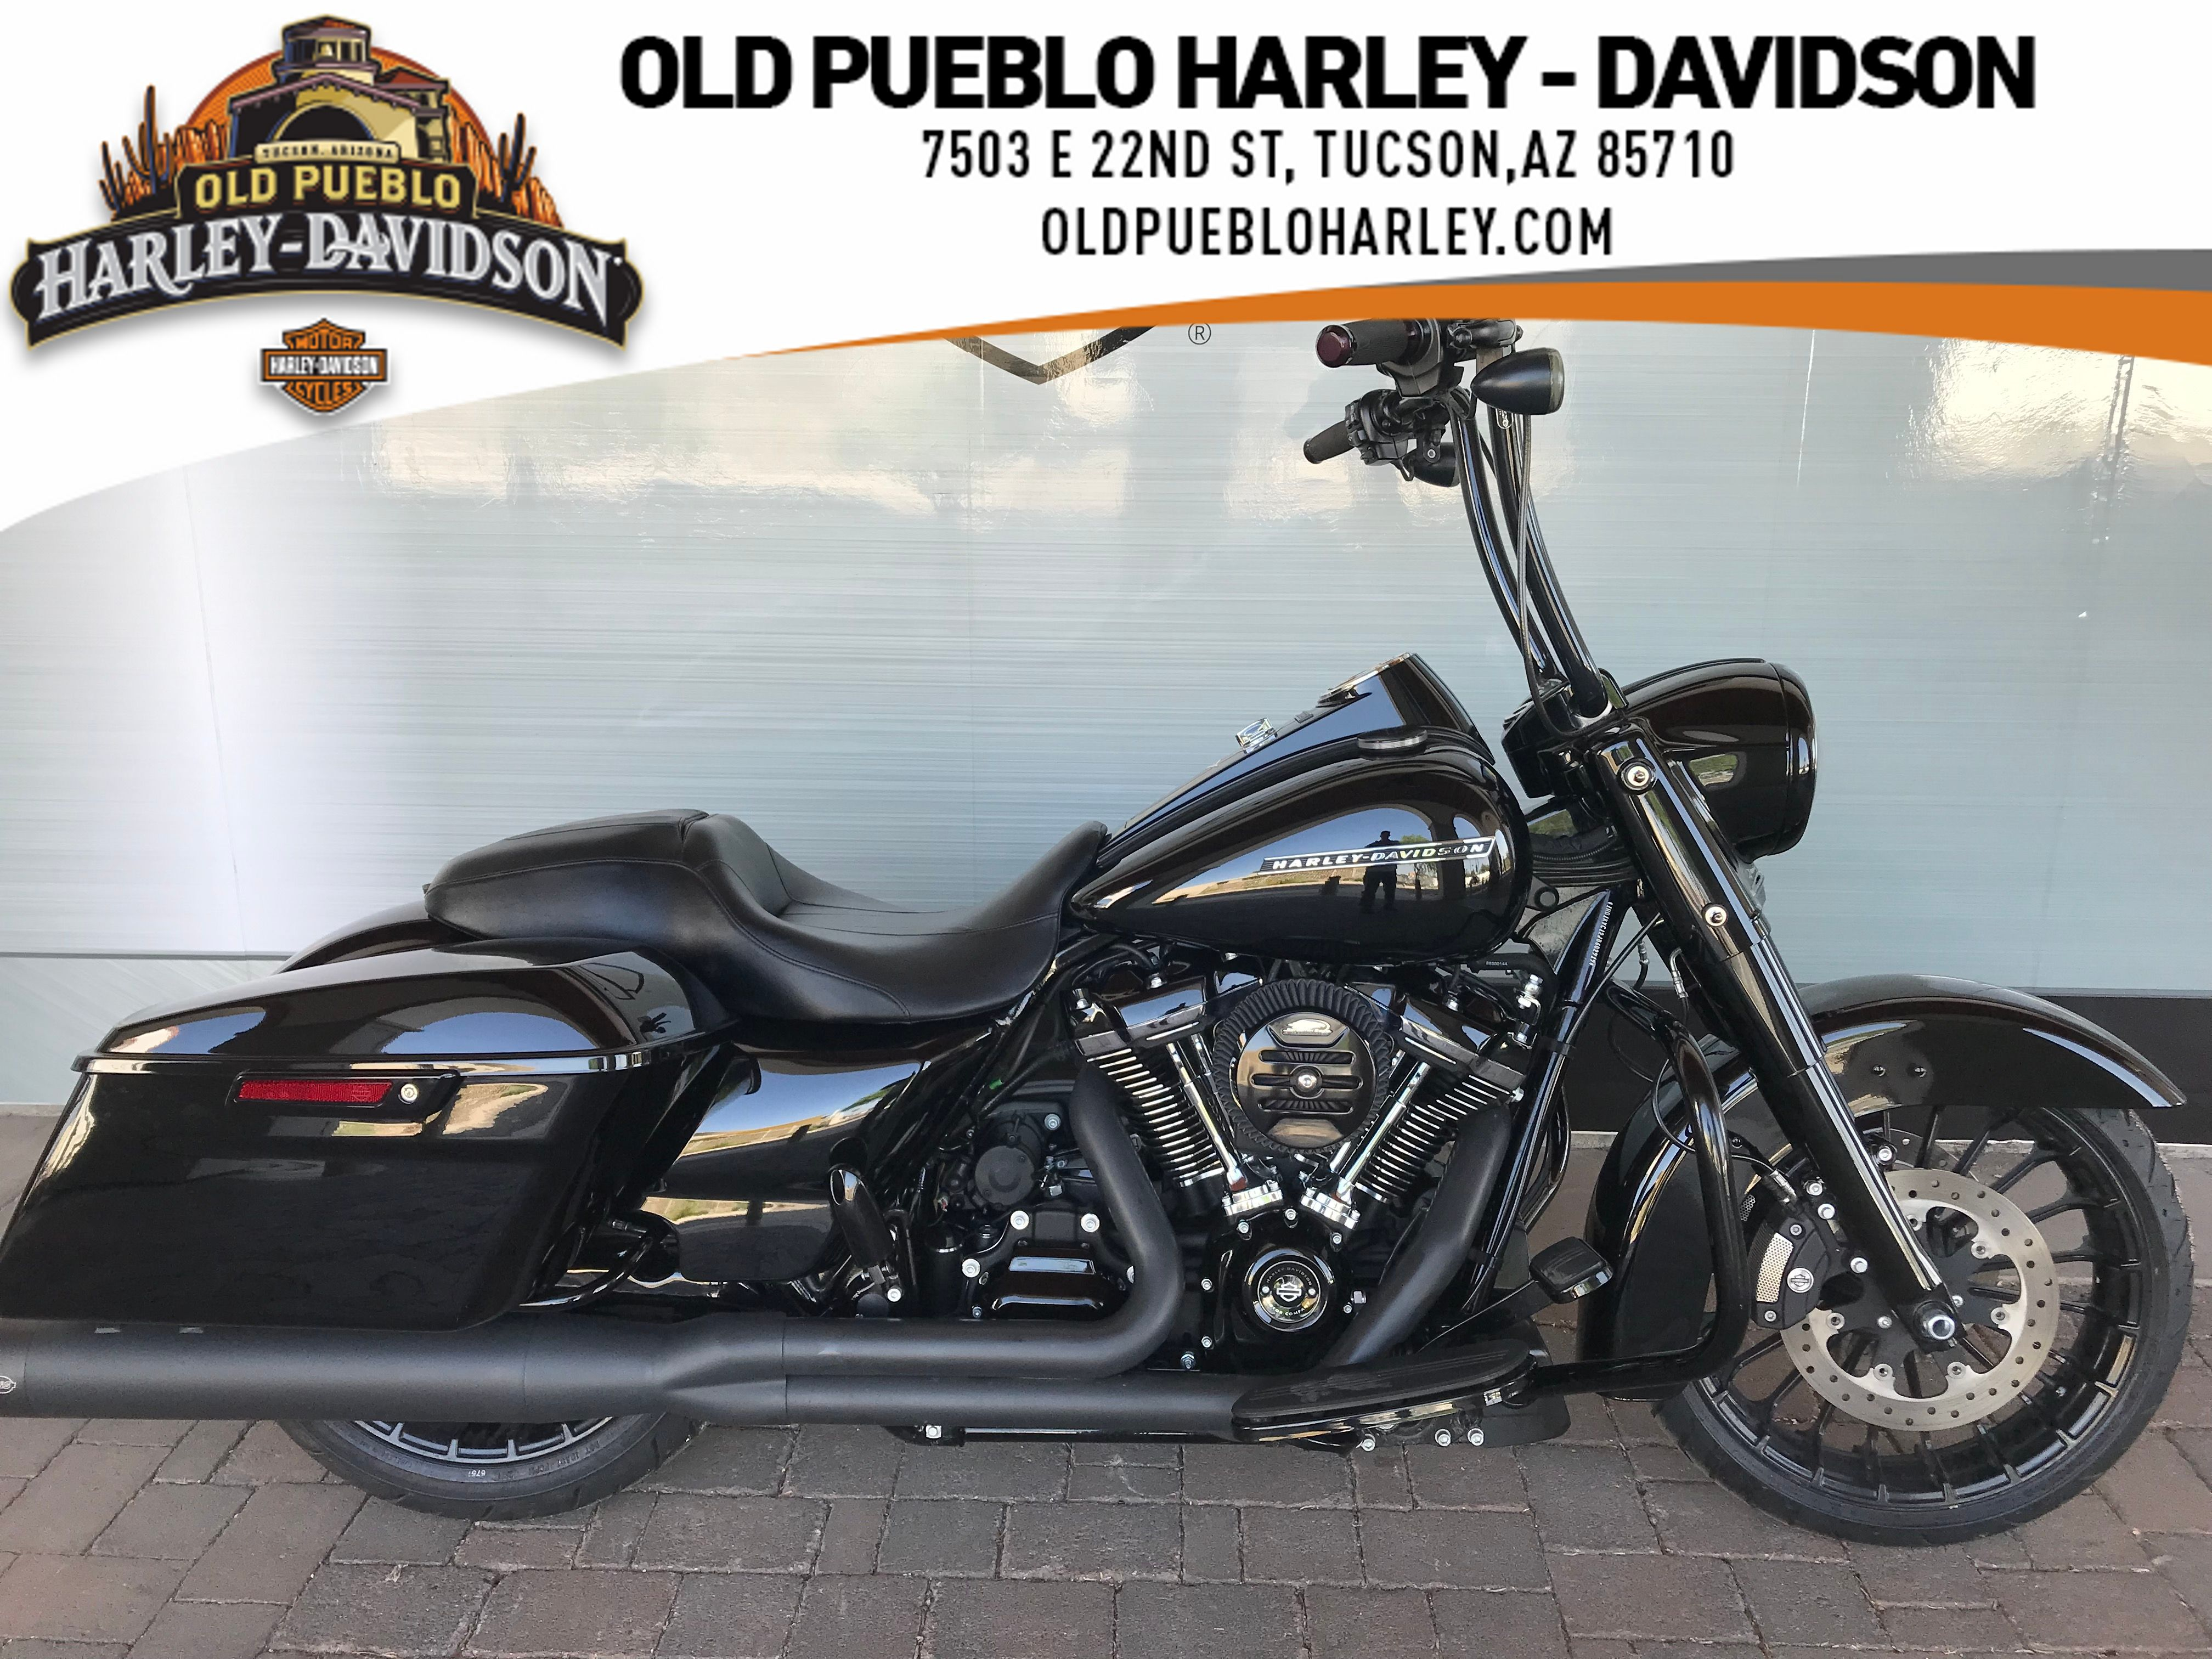 2018 Harley-Davidson Road King Special